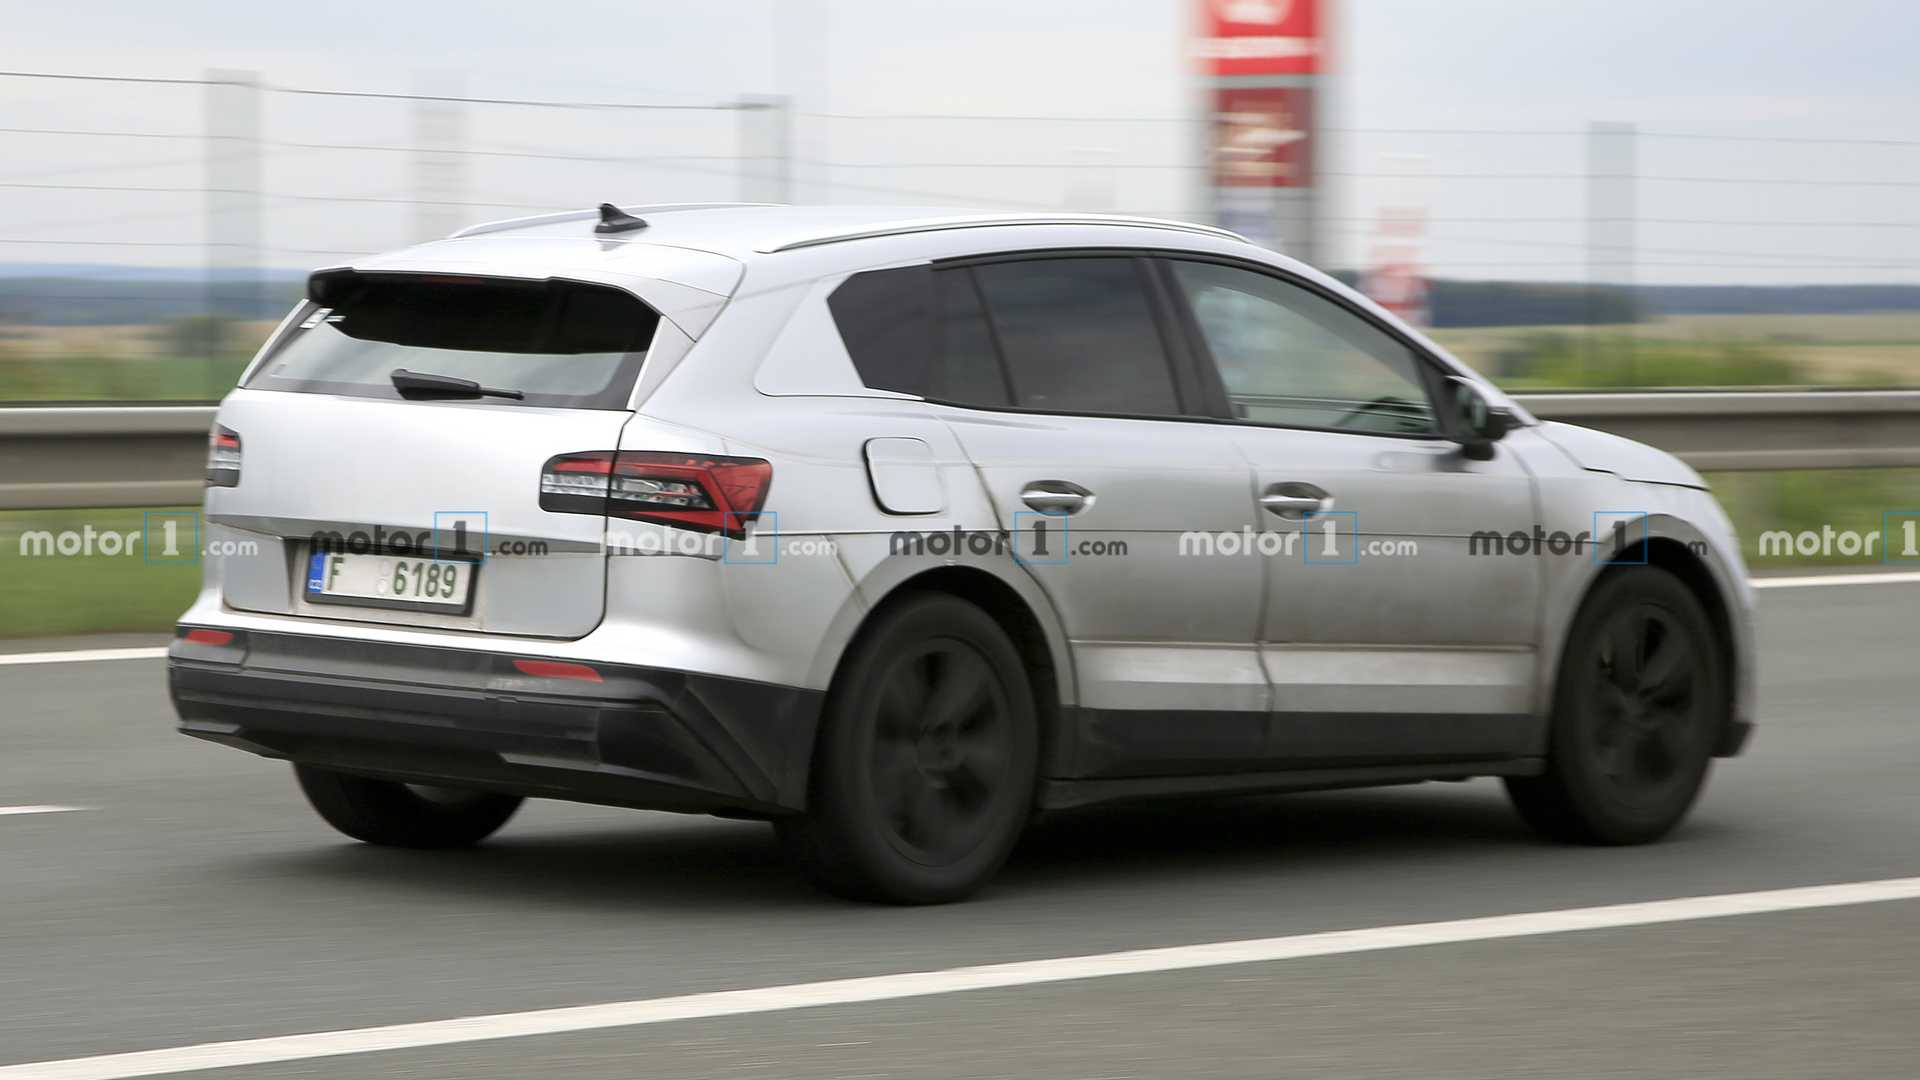 2021 - [Skoda] SUV EV - Page 3 Skoda-enyaq-spy-photos